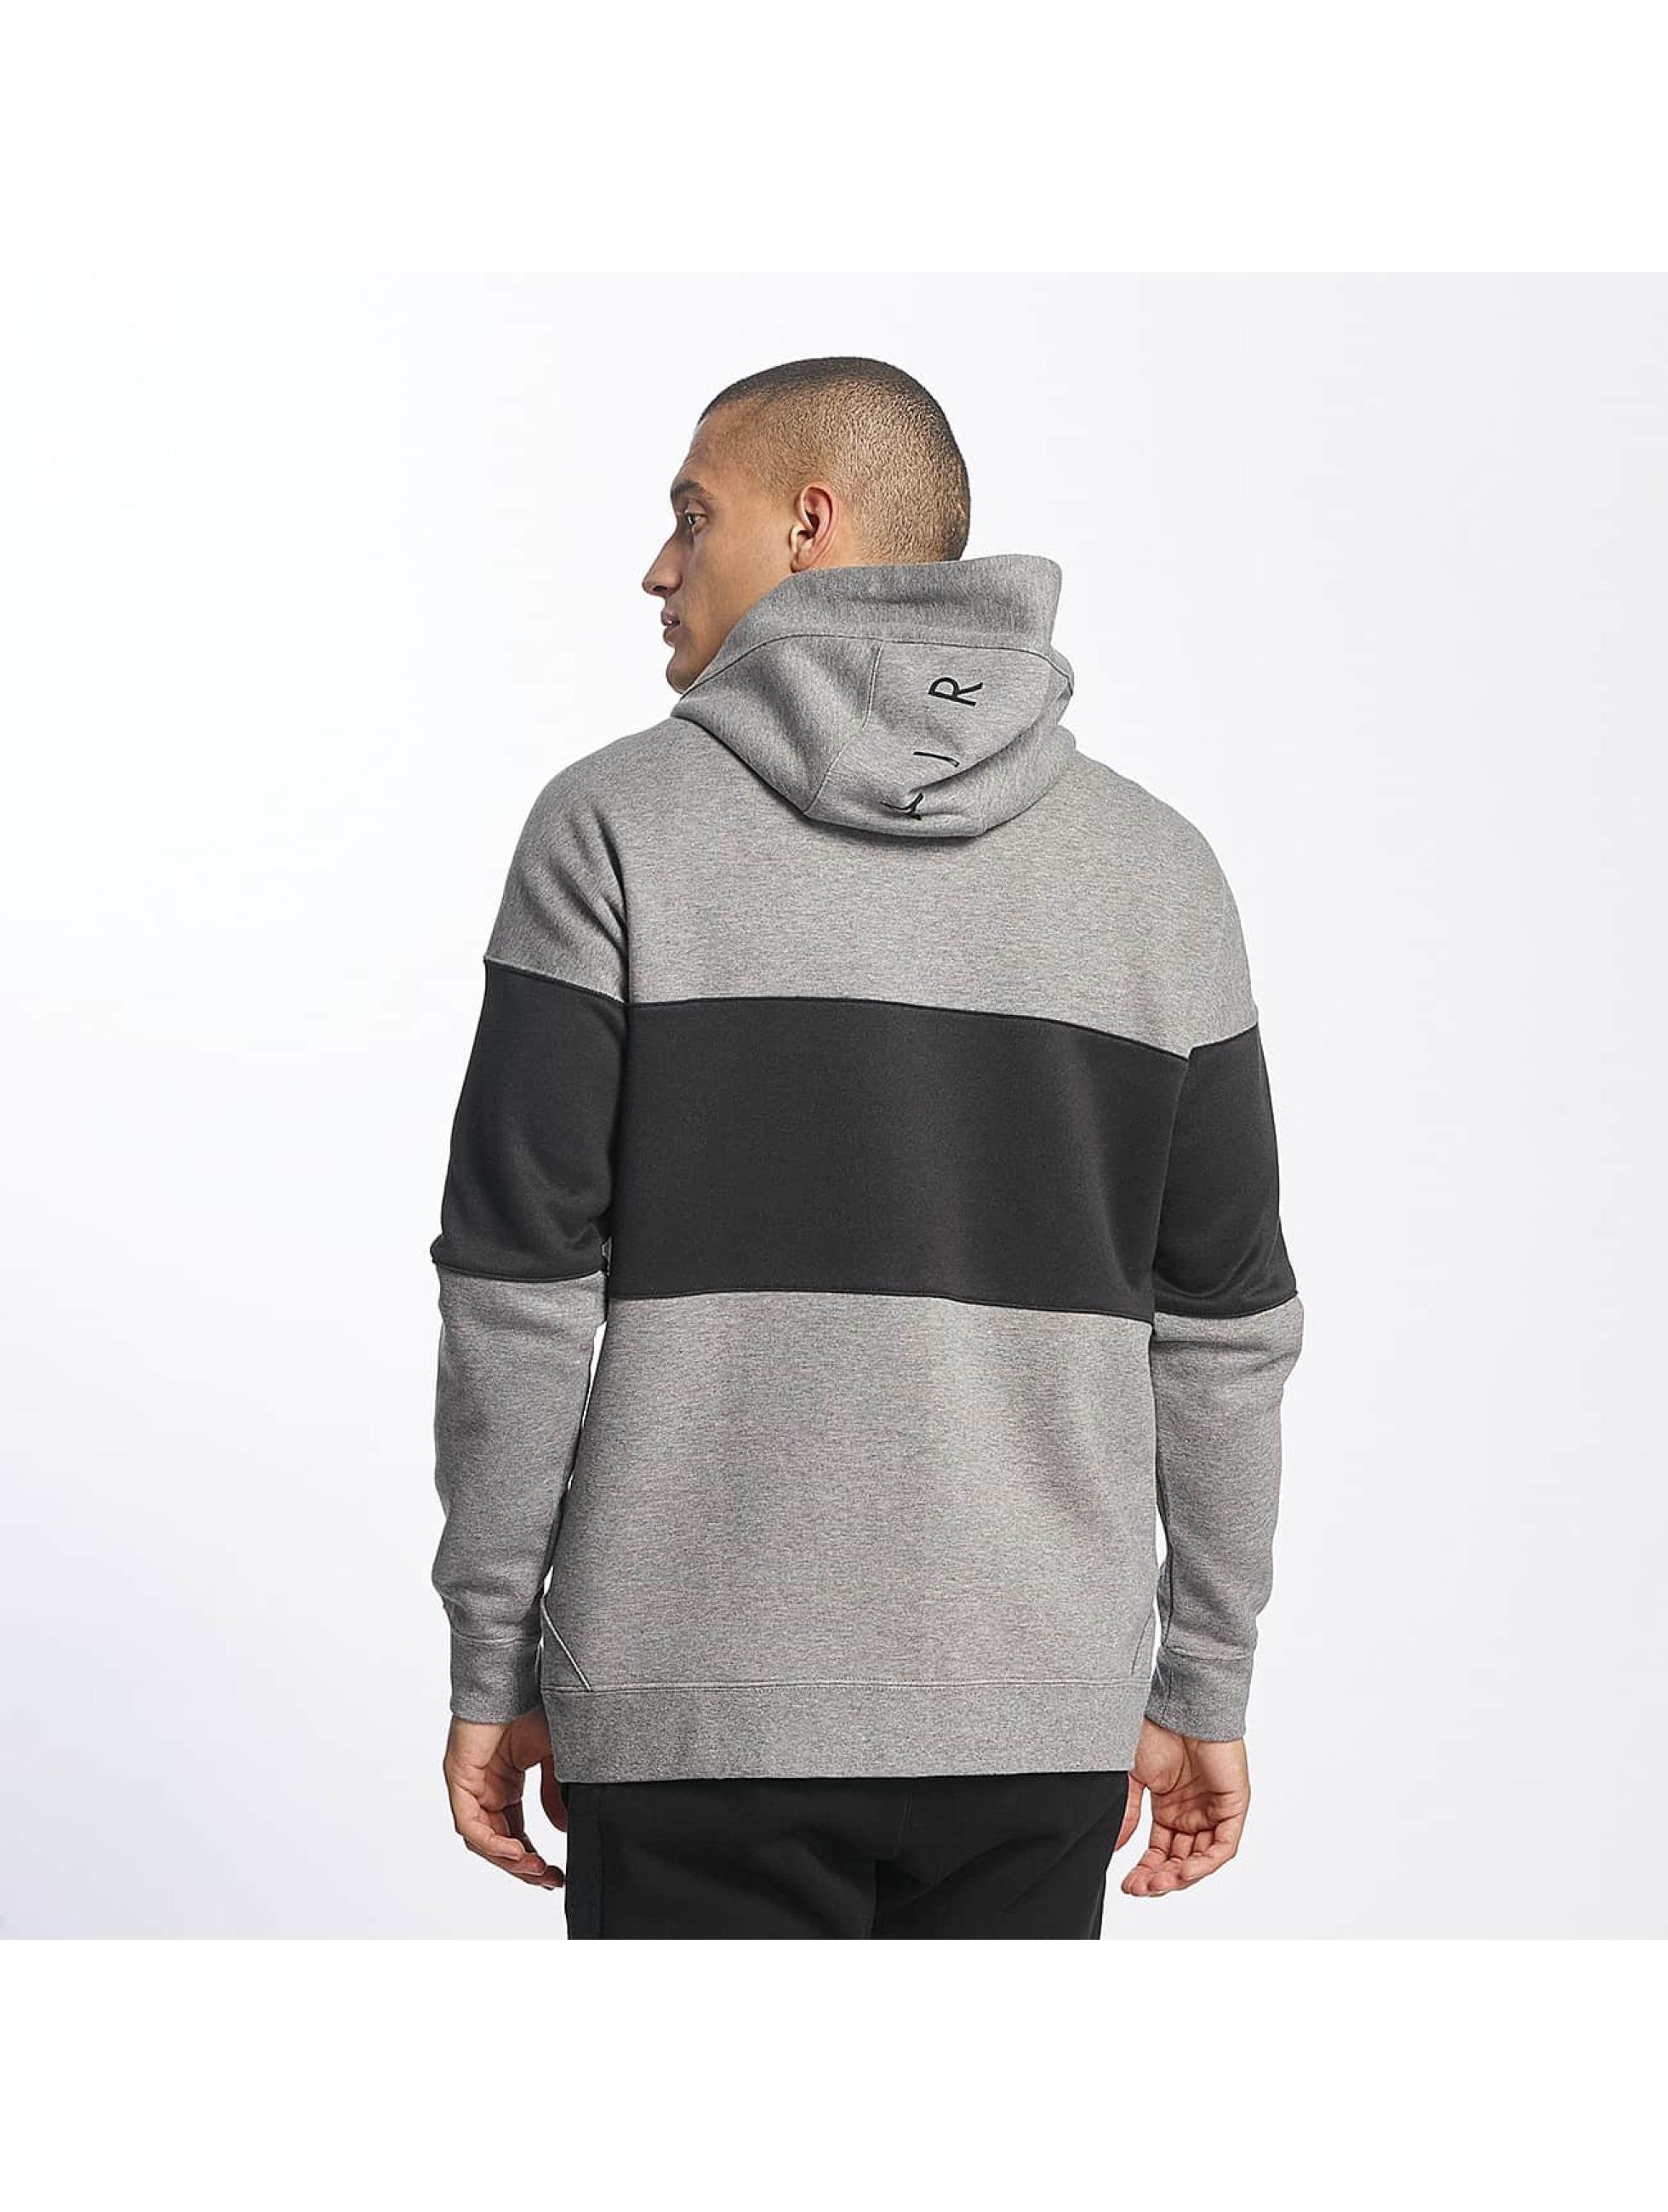 a20a4c30 ... nike hoodie grå - https://cdn.def-shop.com/ ...